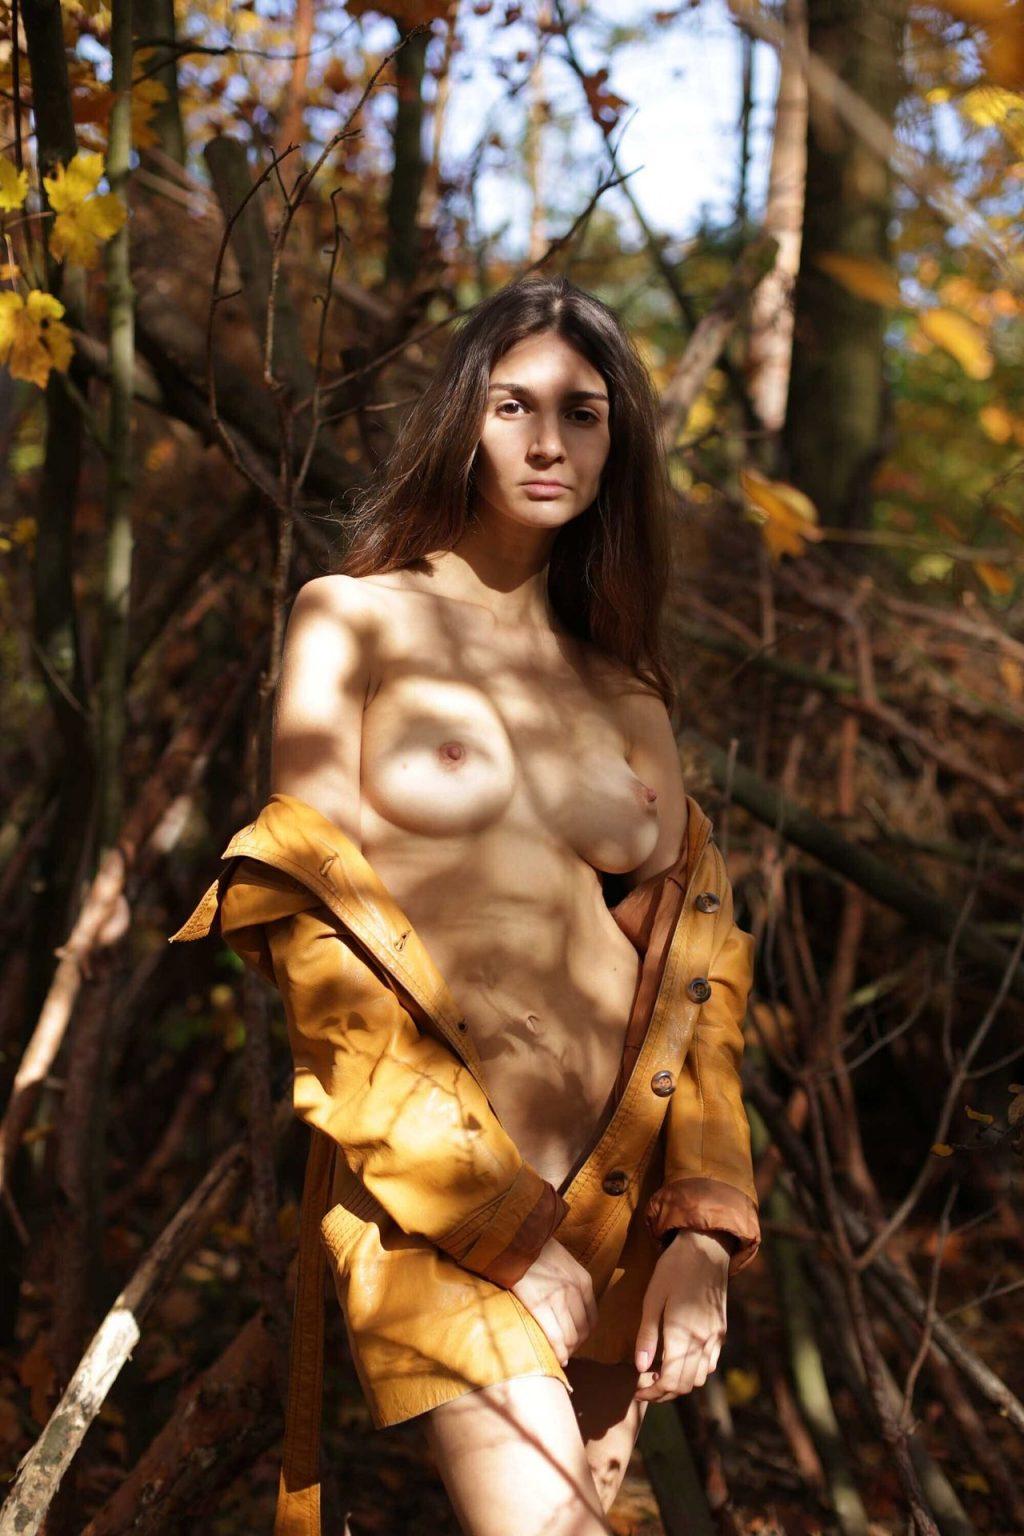 Lina-Lorenza-Nude-Sexy-The-Fappening-Blog-com-19-1024x1536